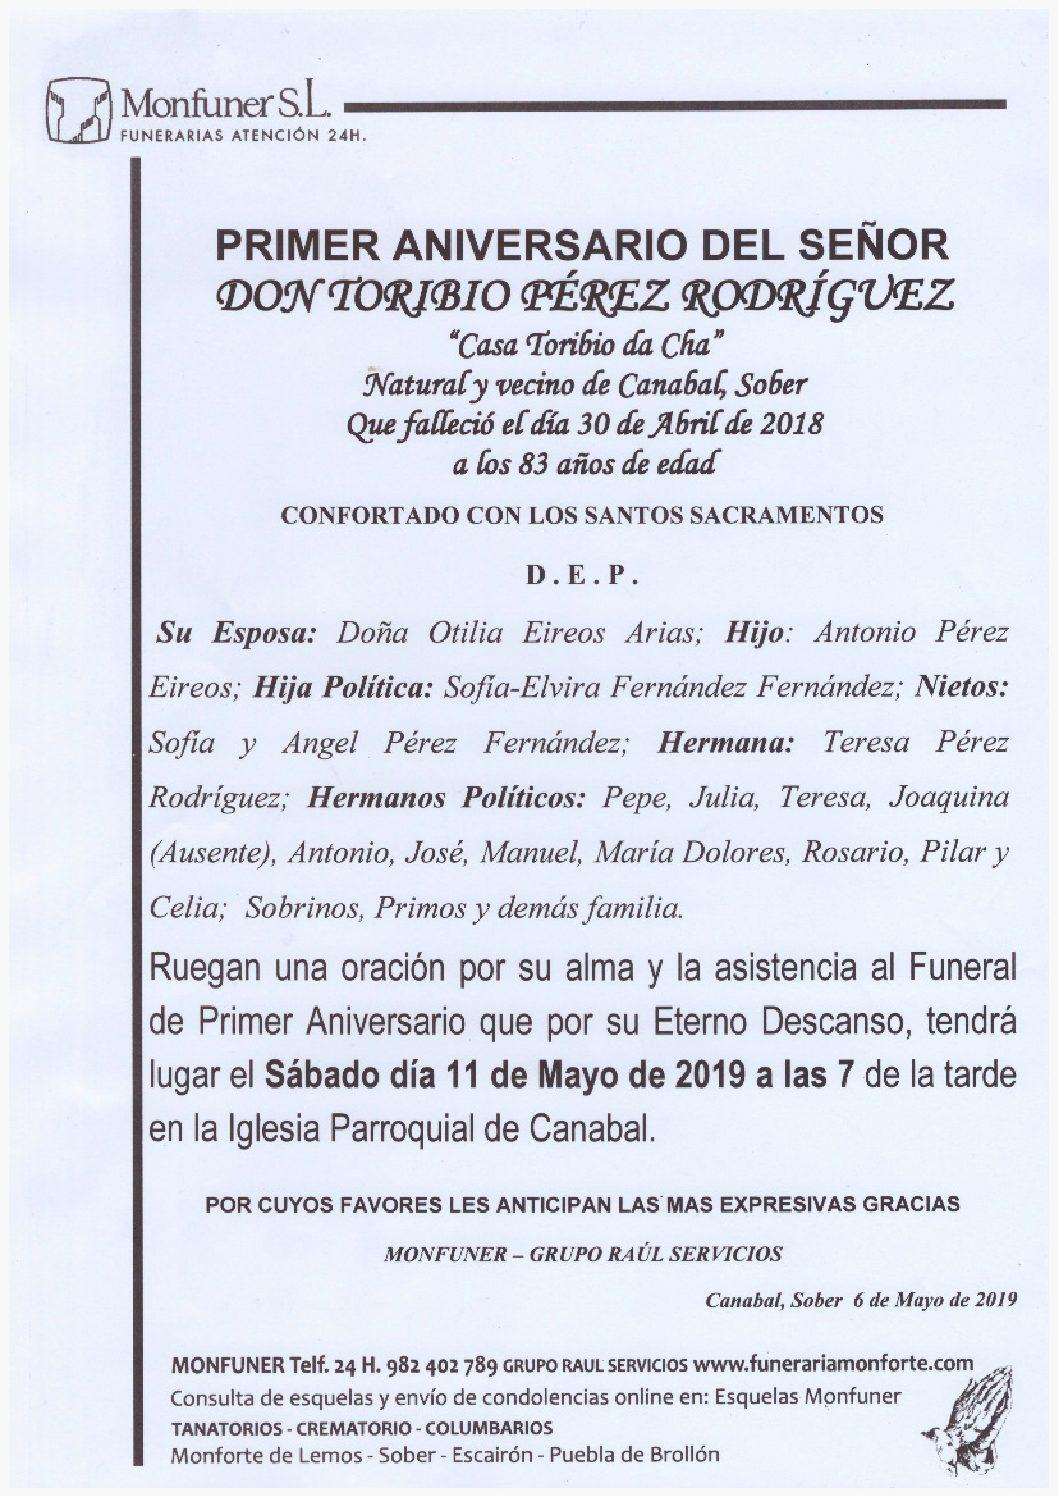 PRIMER ANIVERSARIO DE DON TORIBIO PEREZ RODRIGUEZ